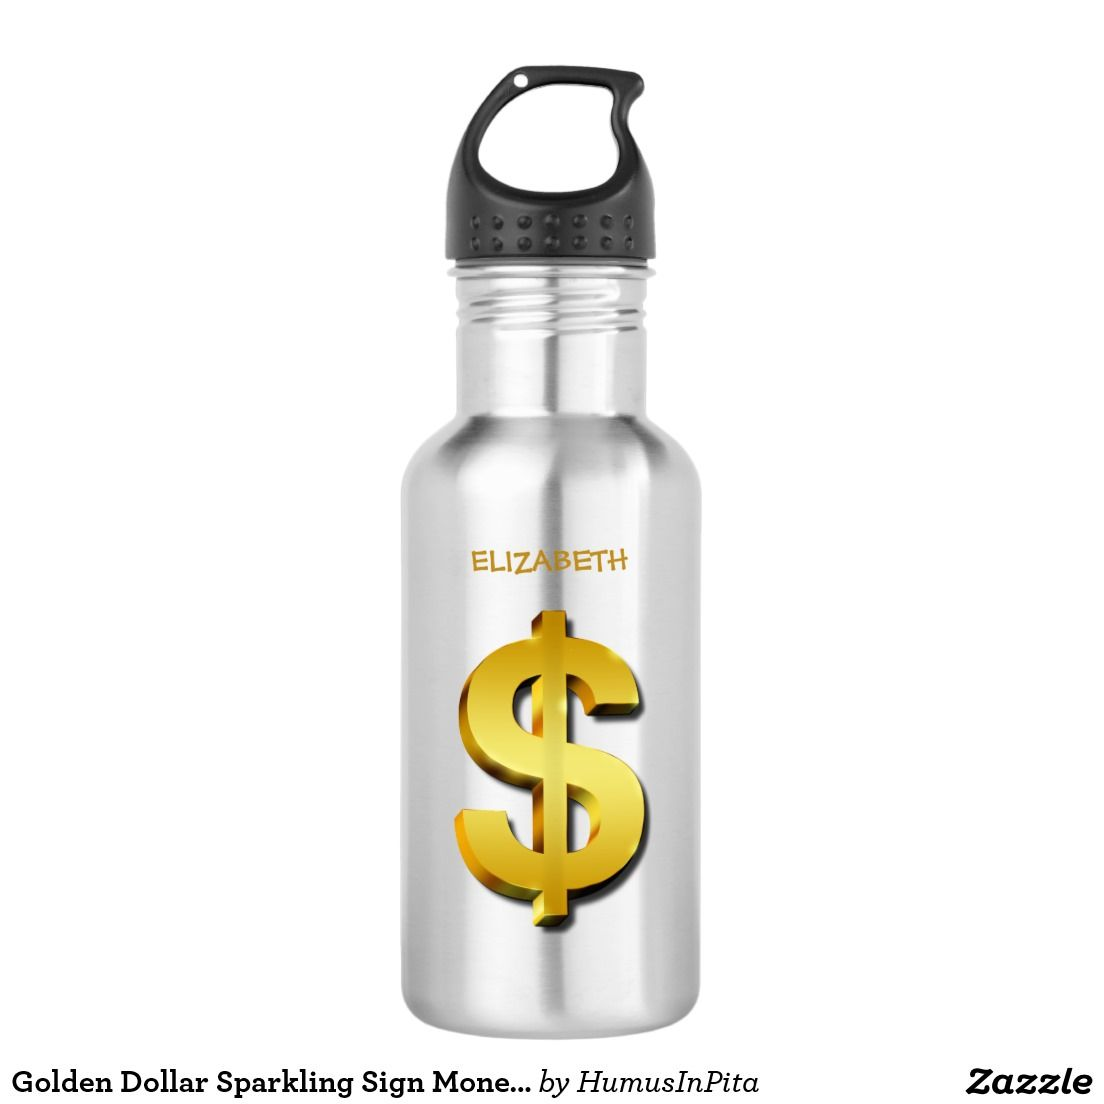 Golden Dollar Sparkling Sign Money Symbol Water Bottle Wear